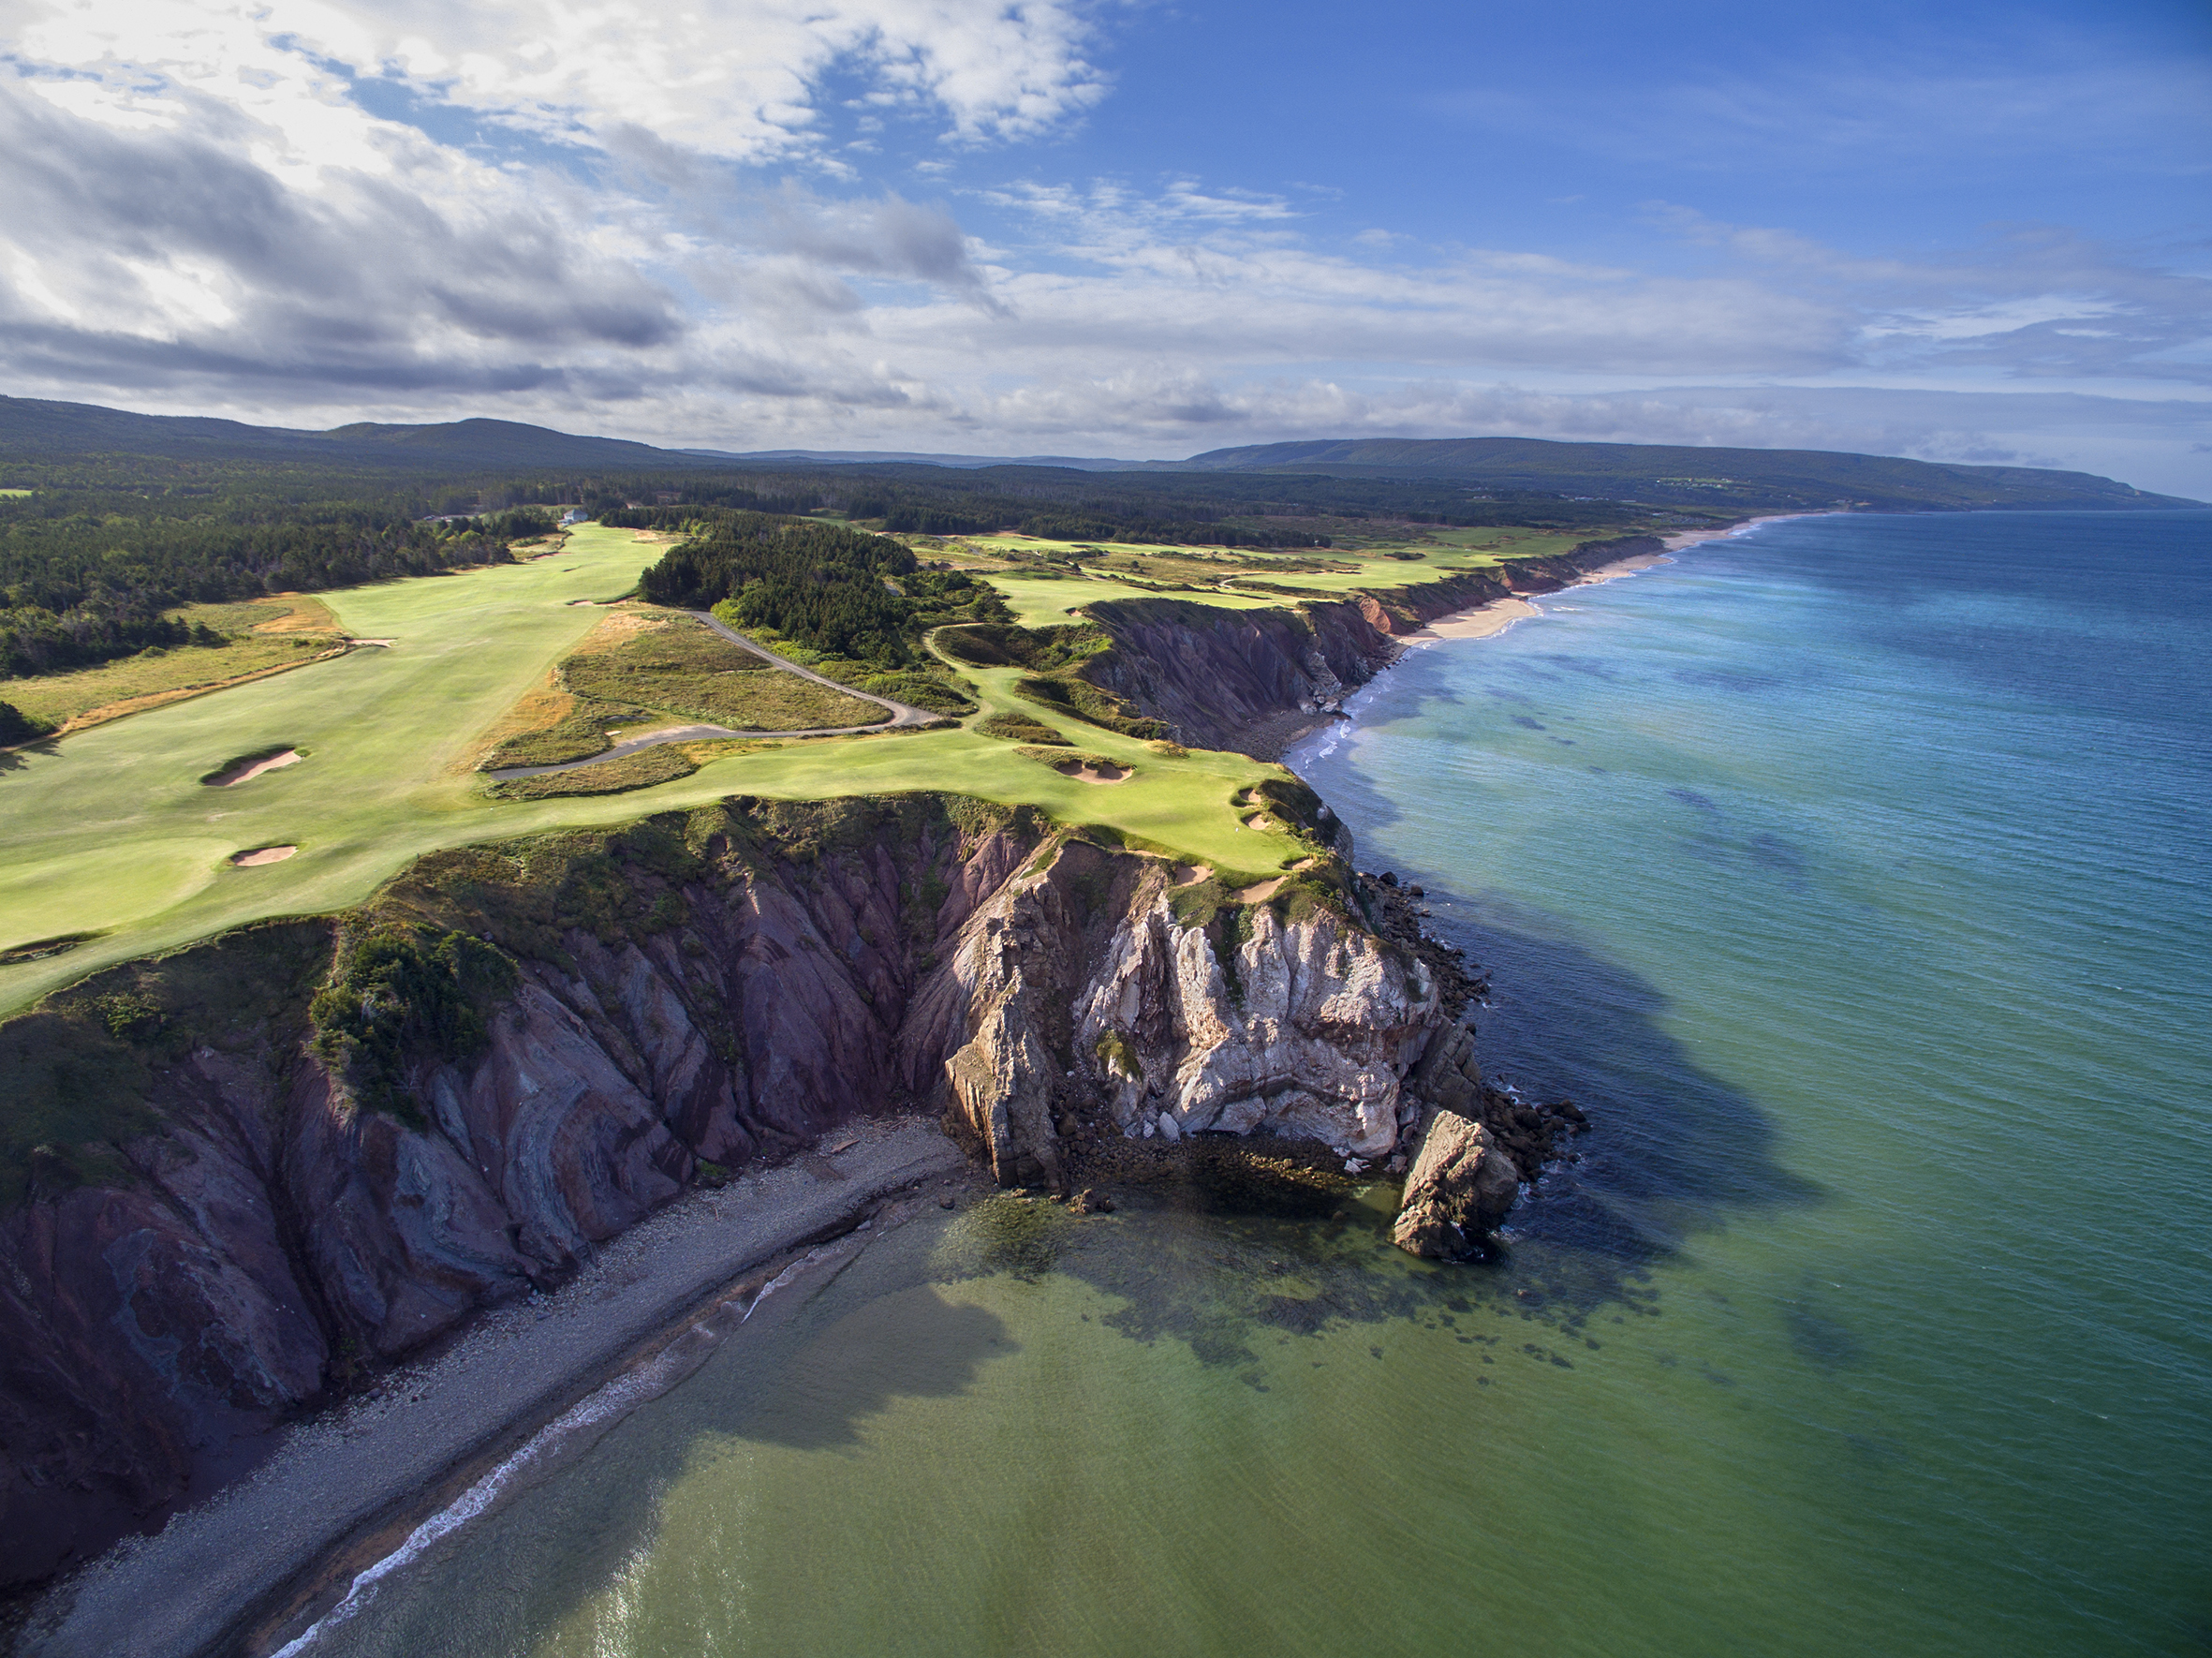 golf photography tips with evan schiller